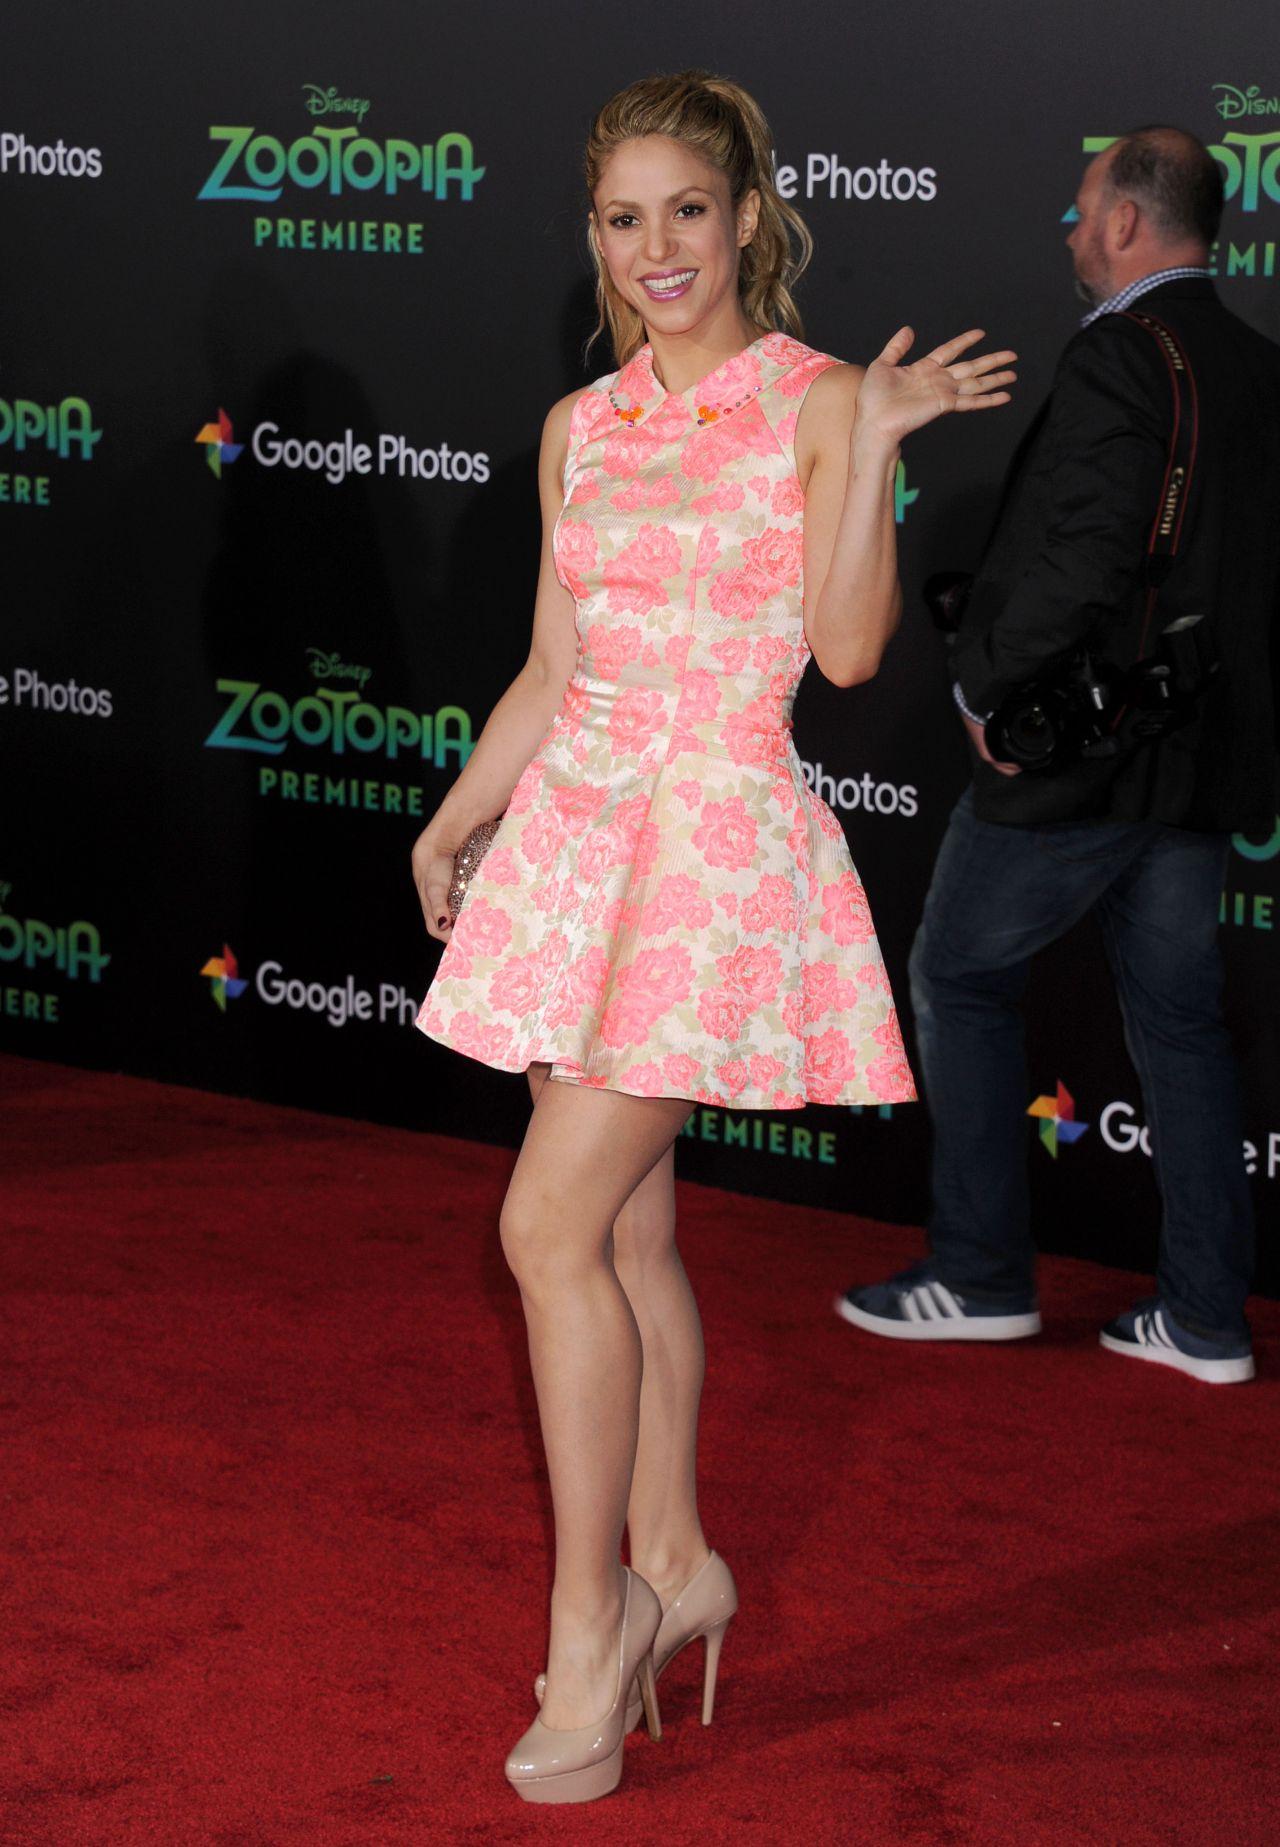 Shakira Zootopia Premiere In Hollywood Ca